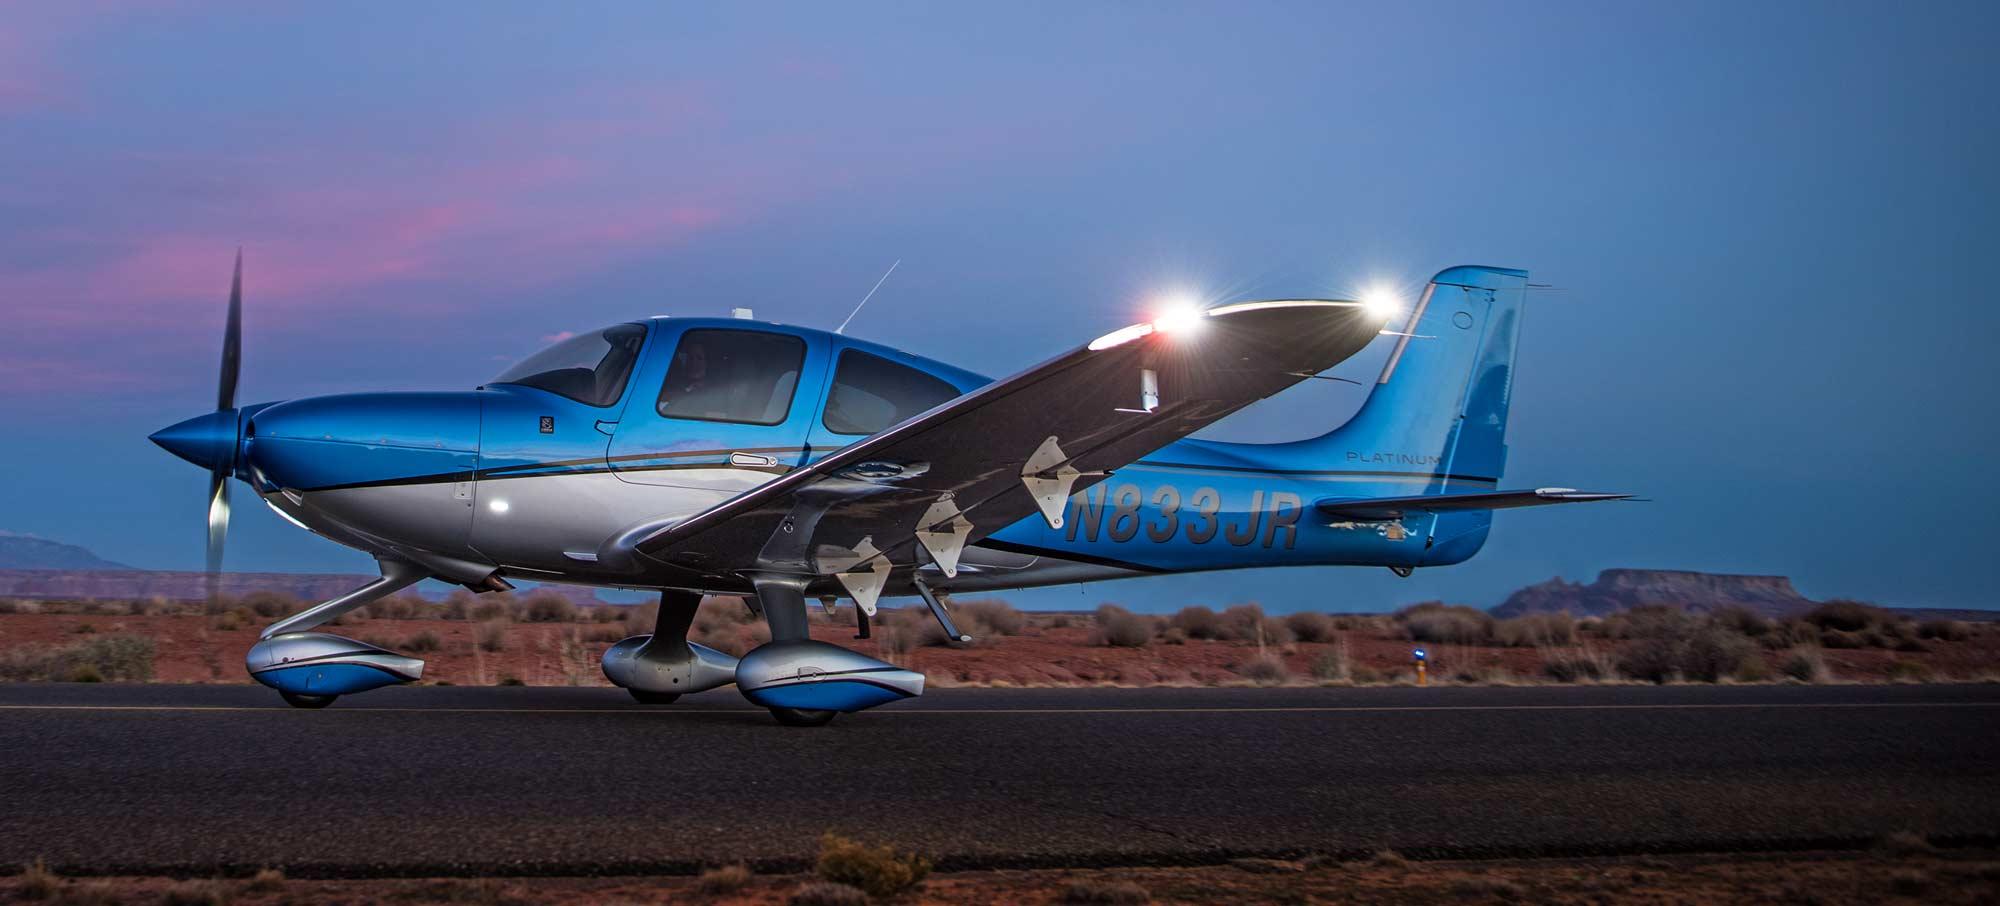 Cirrus Aircraft G6 Smarter Safer Faster